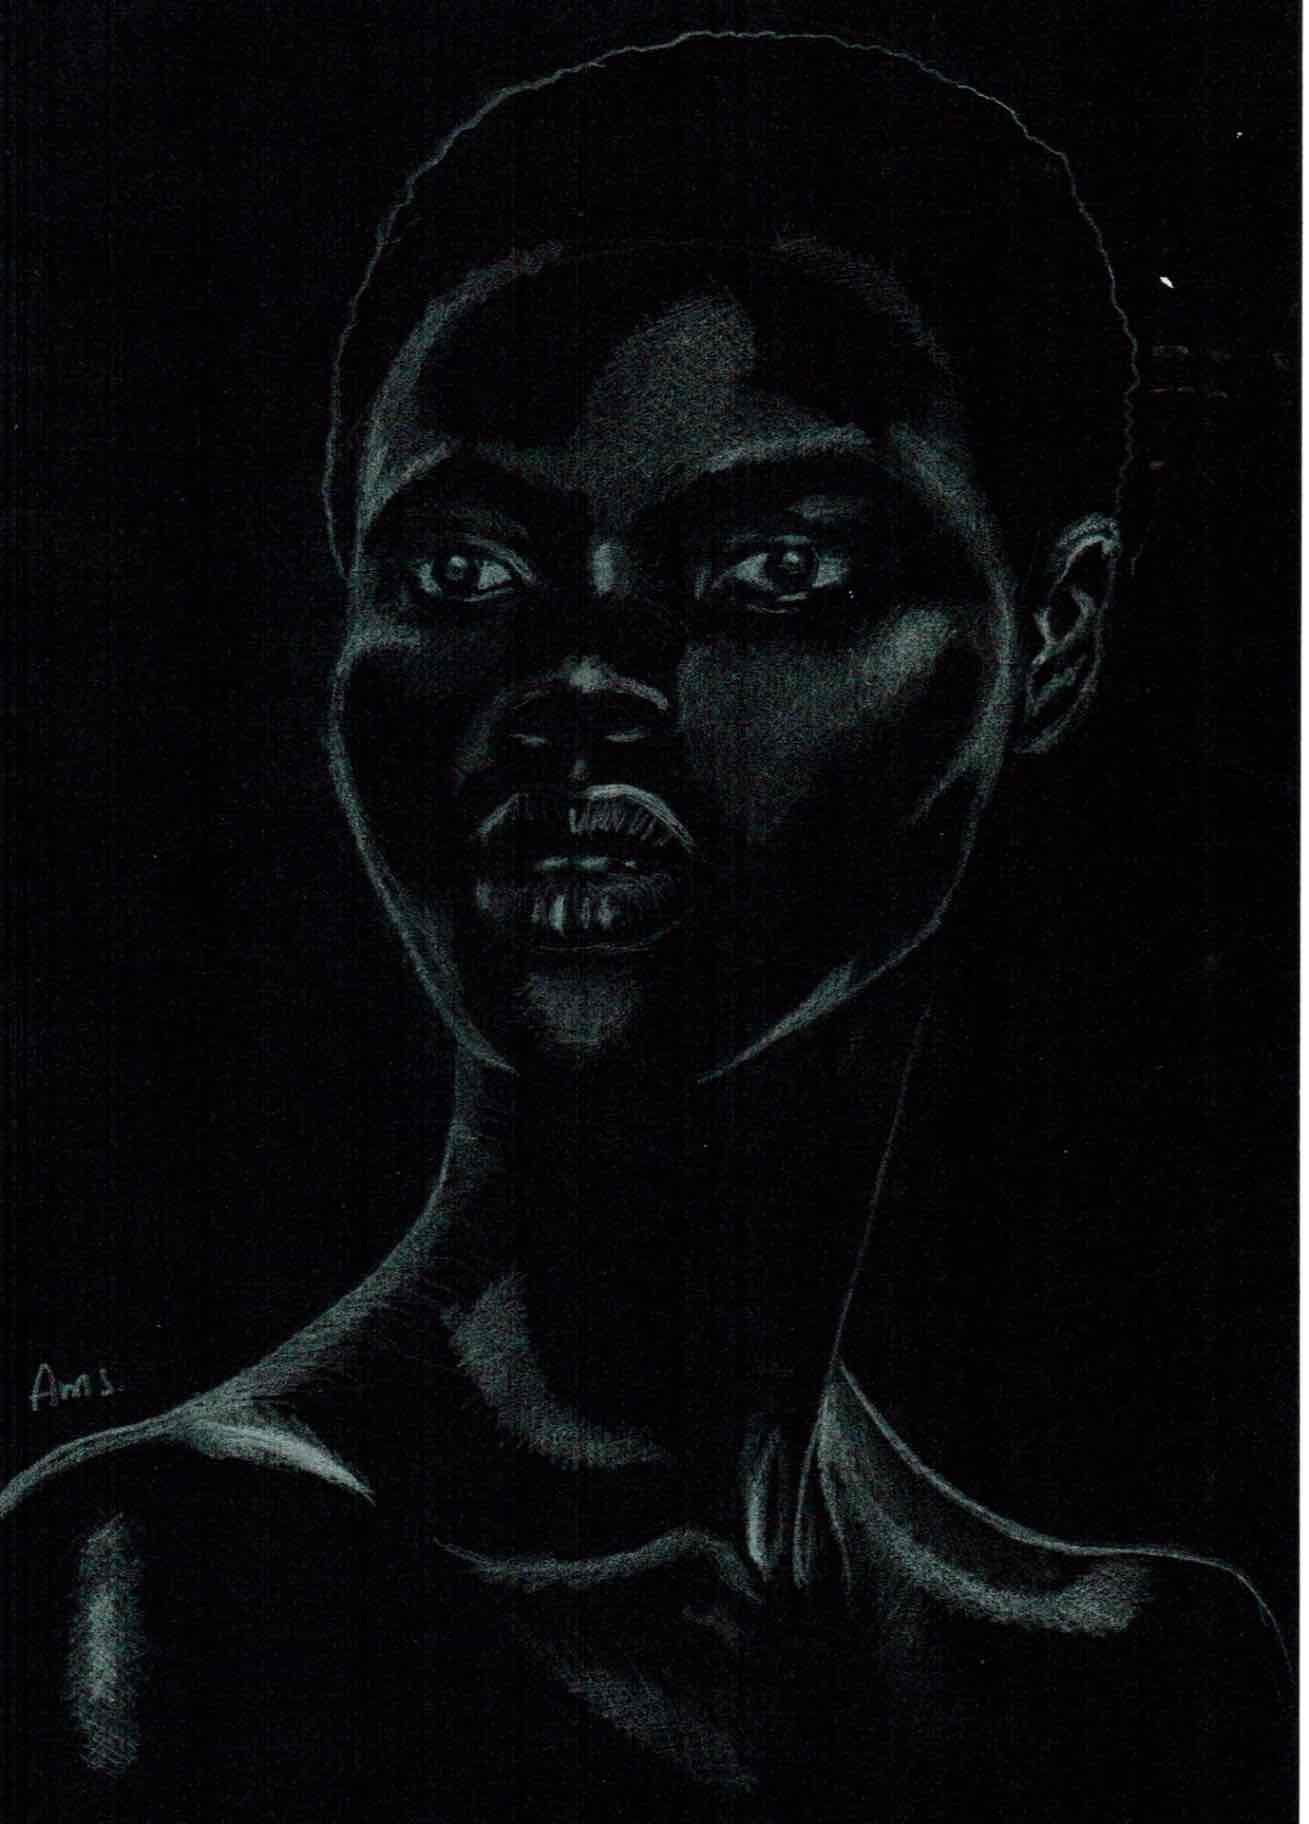 Obra: Pieza #7 de serie Black Girls Matter